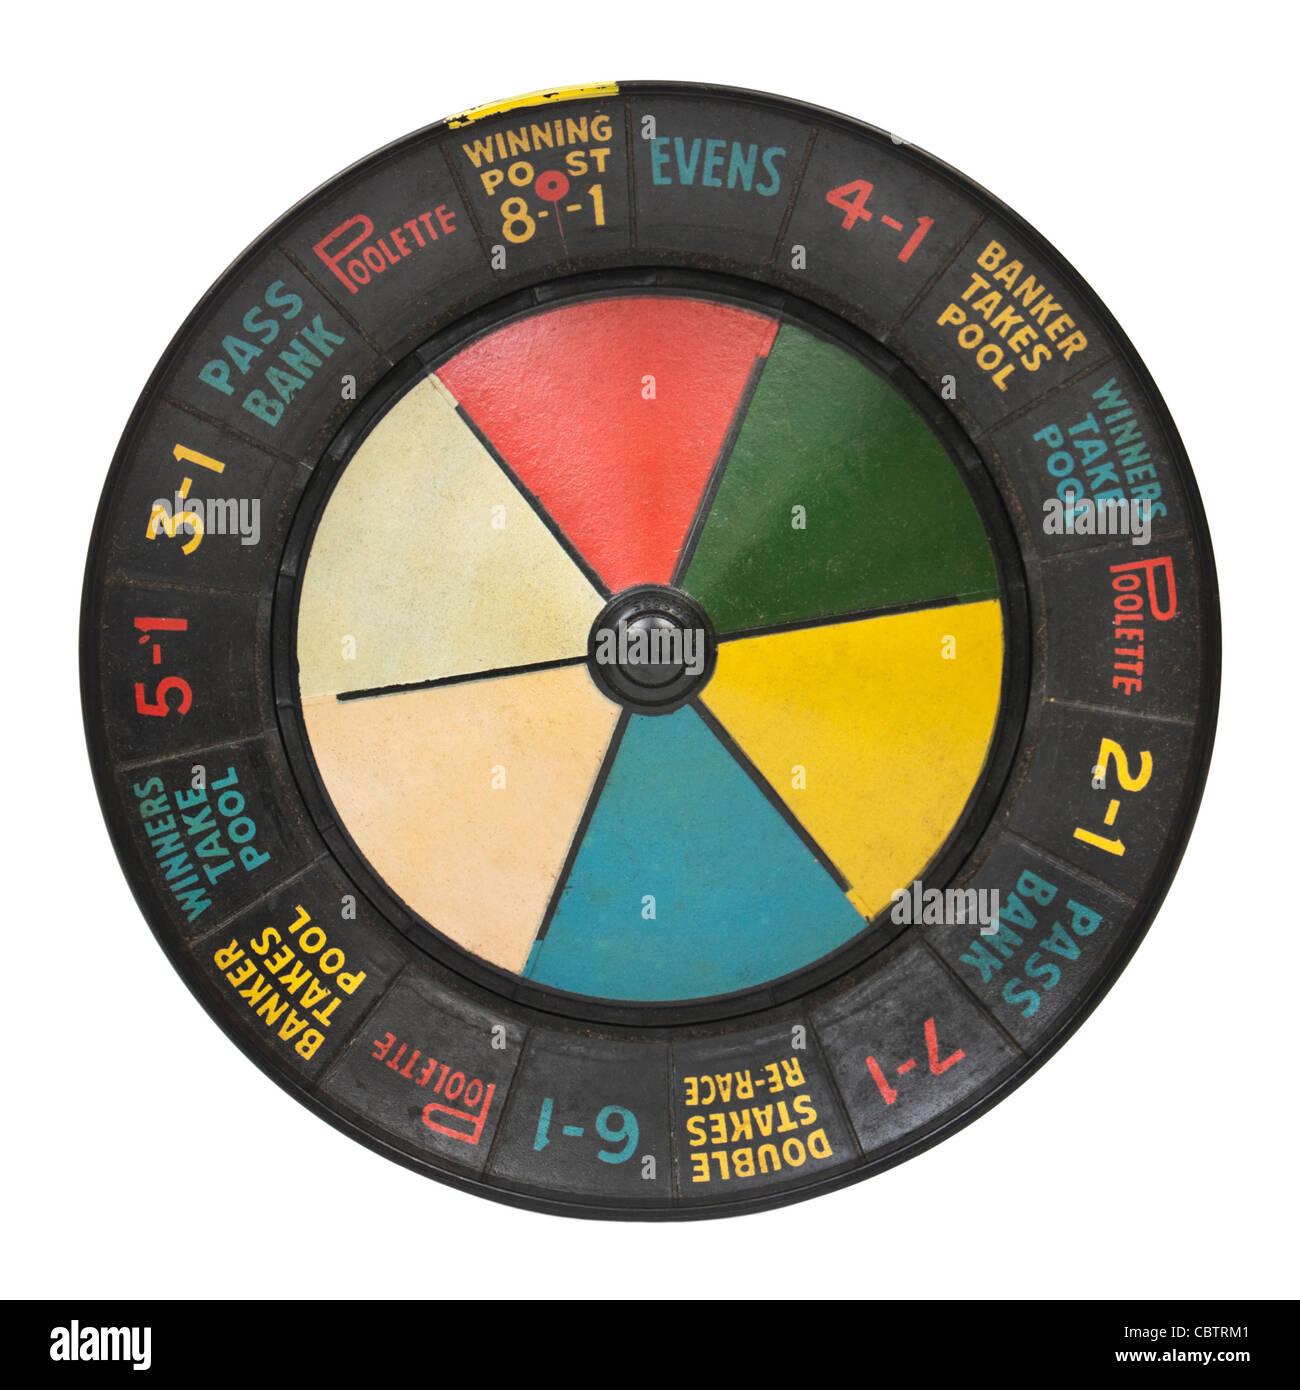 1930's vintage 'Poolette' bakelite roulette wheel / board game - Stock Image